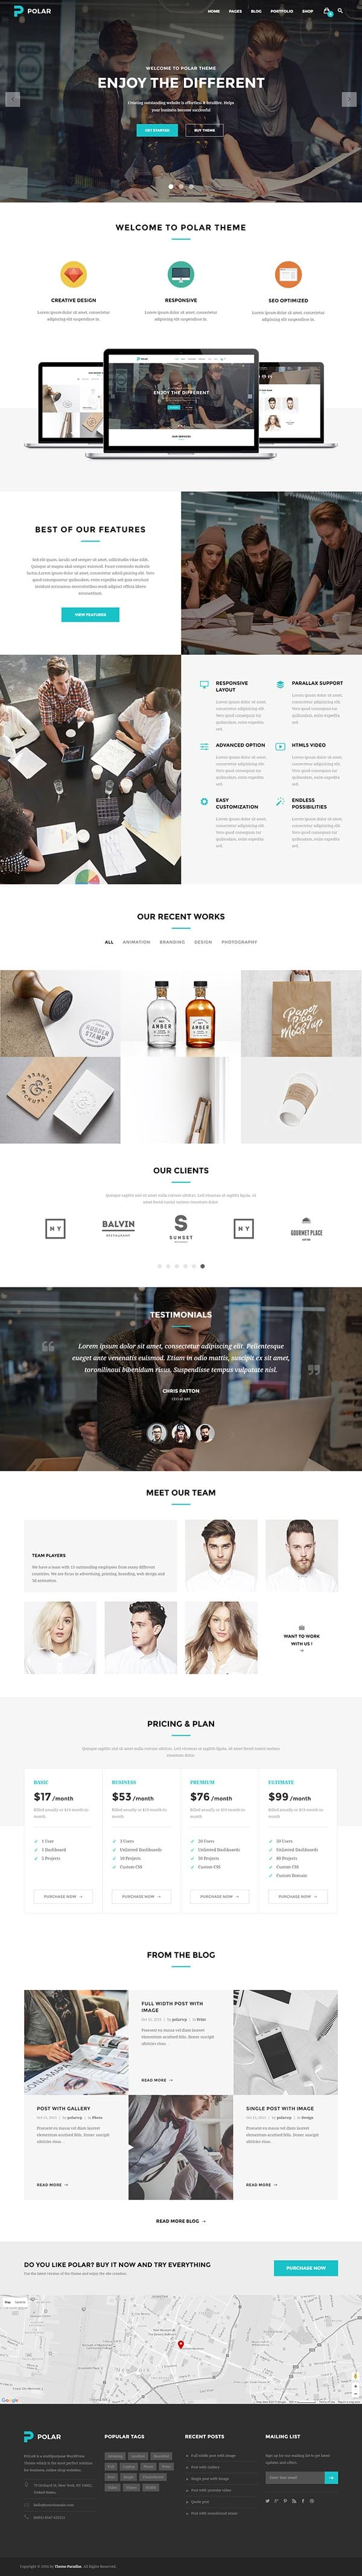 Polar-WordPress-Theme-Screen-Short